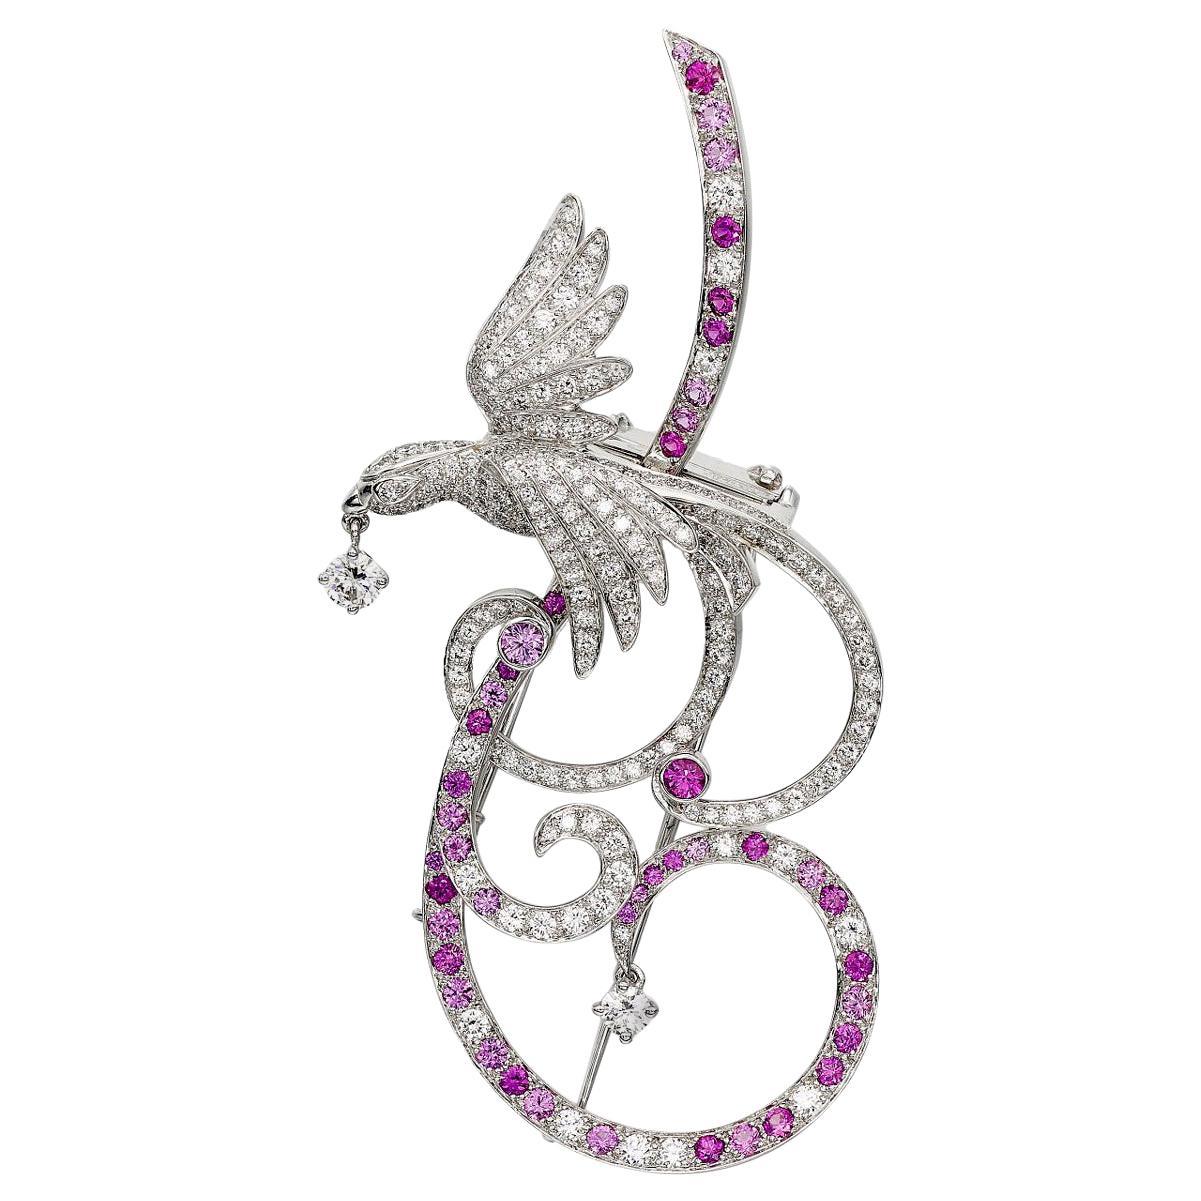 Van Cleef & Arpels Birds of Paradise Pink Sapphire Diamond Brooch Pendant